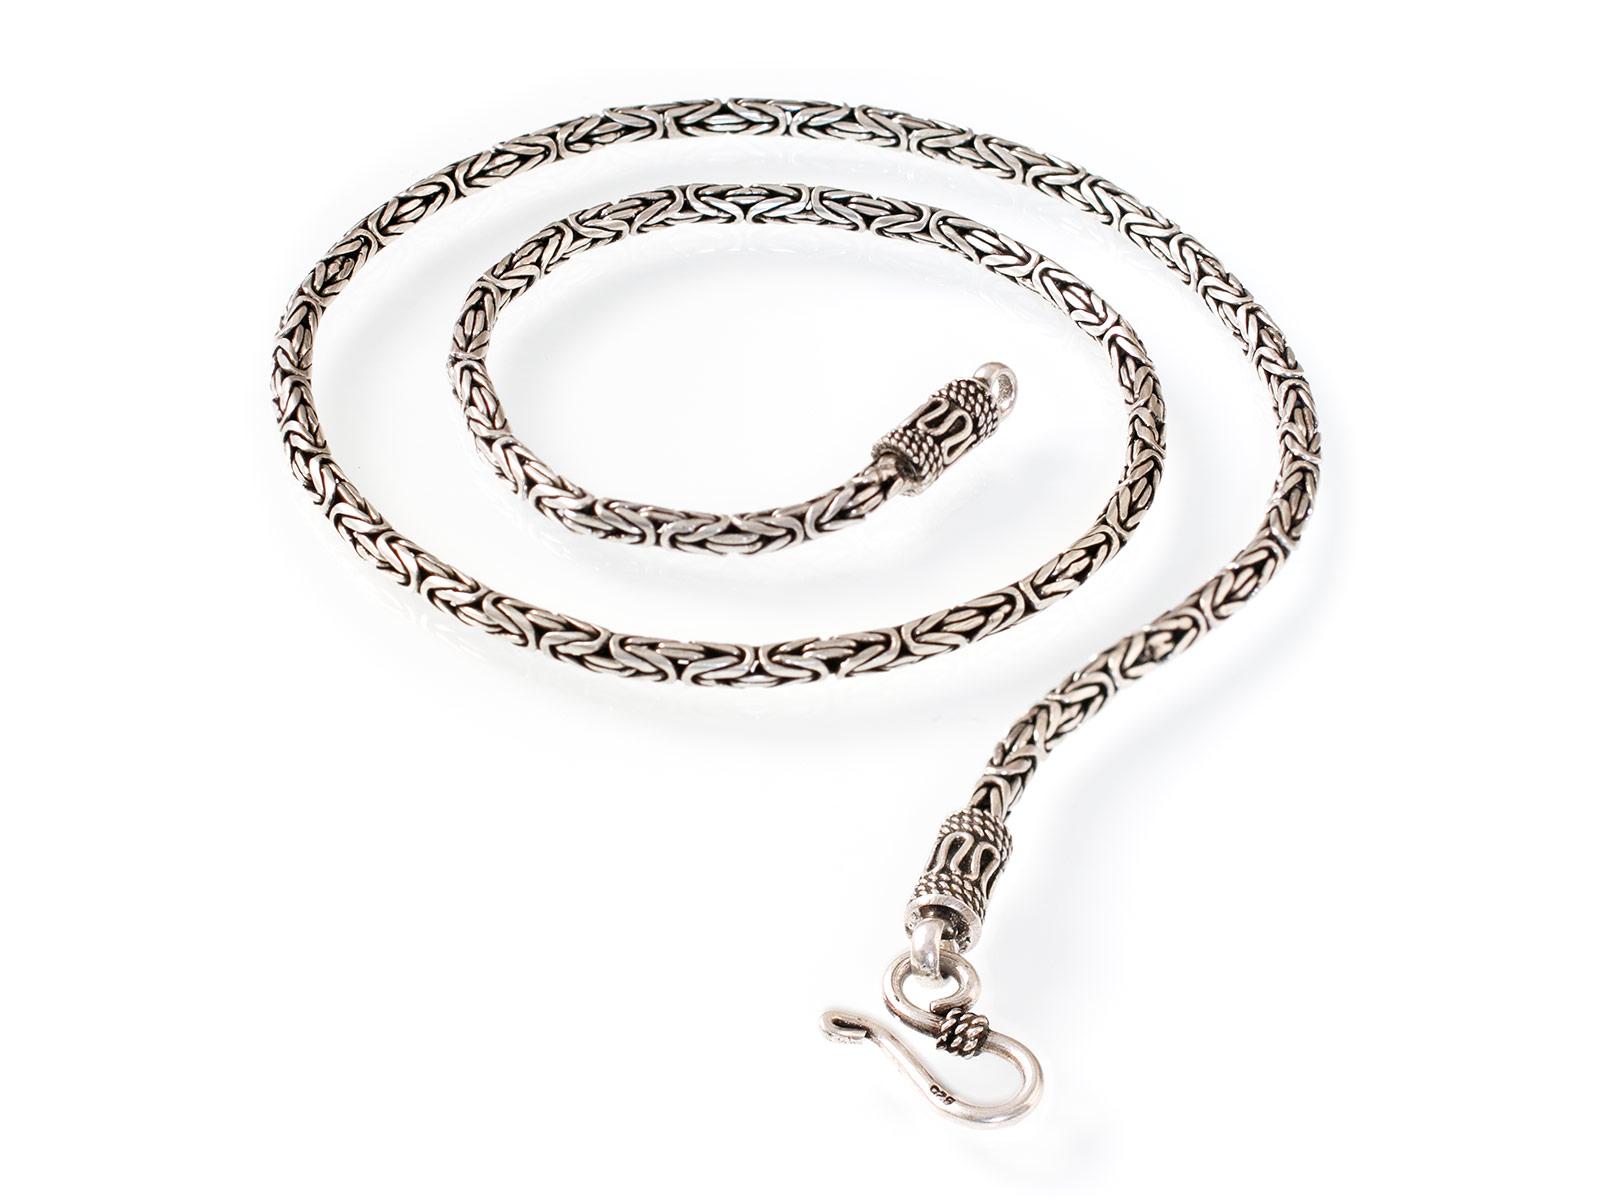 2714fa80b7b2 Cadena Bizantina - Pulsera o Collar de Plata 925 3.2 -10 mm